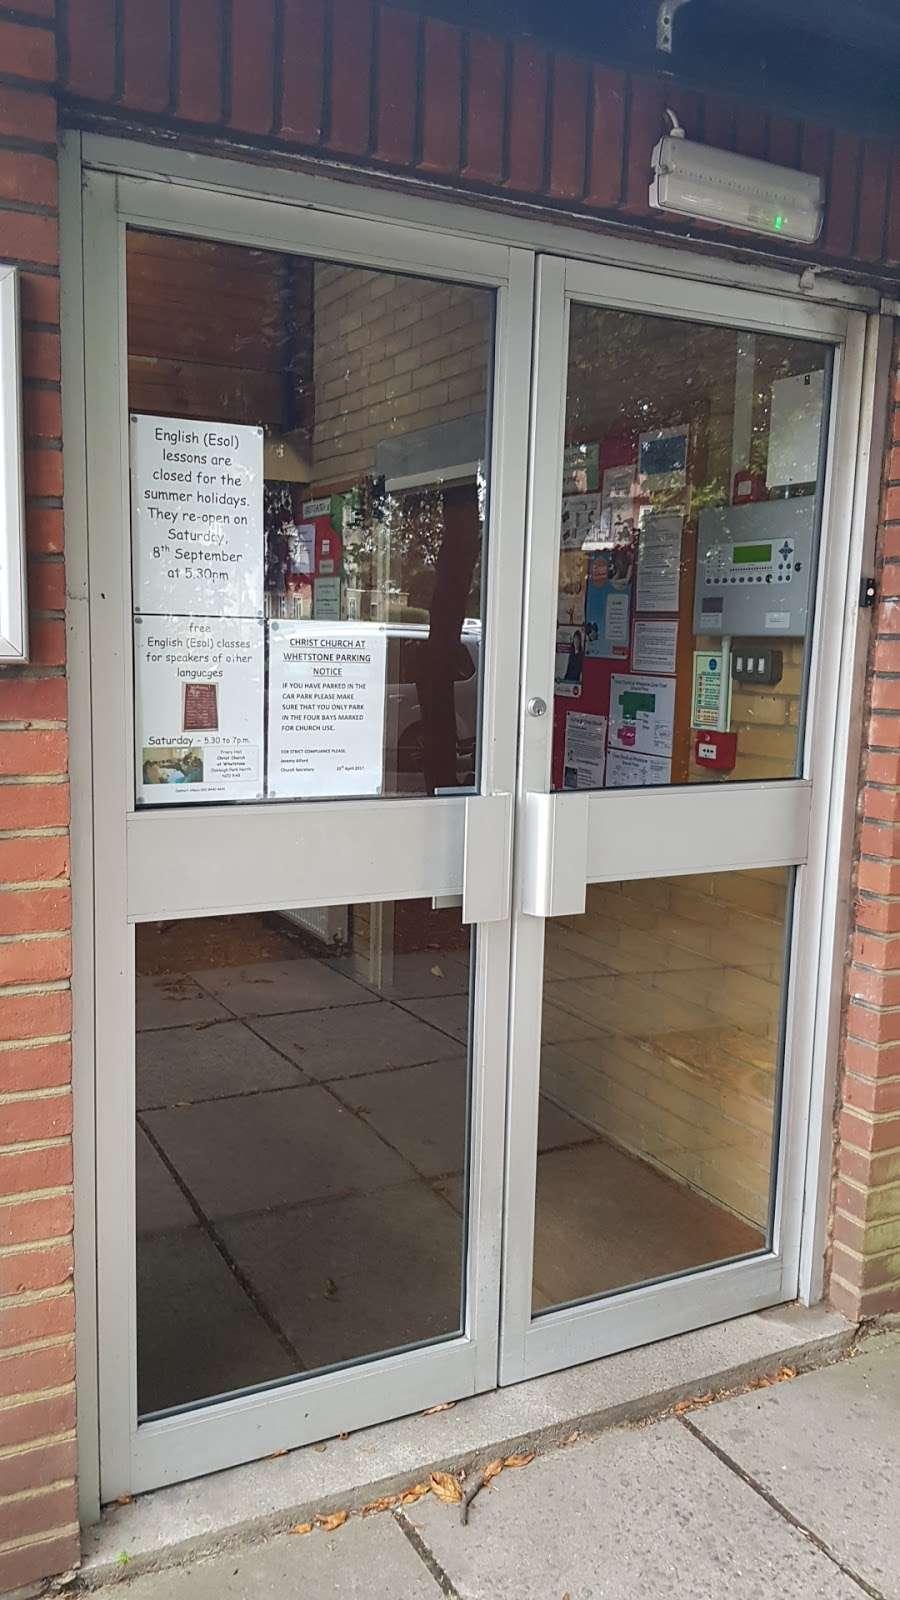 Christ Church - church  | Photo 1 of 9 | Address: Oakleigh Park N, Whetstone, London N20 9AR, UK | Phone: 020 3234 4059